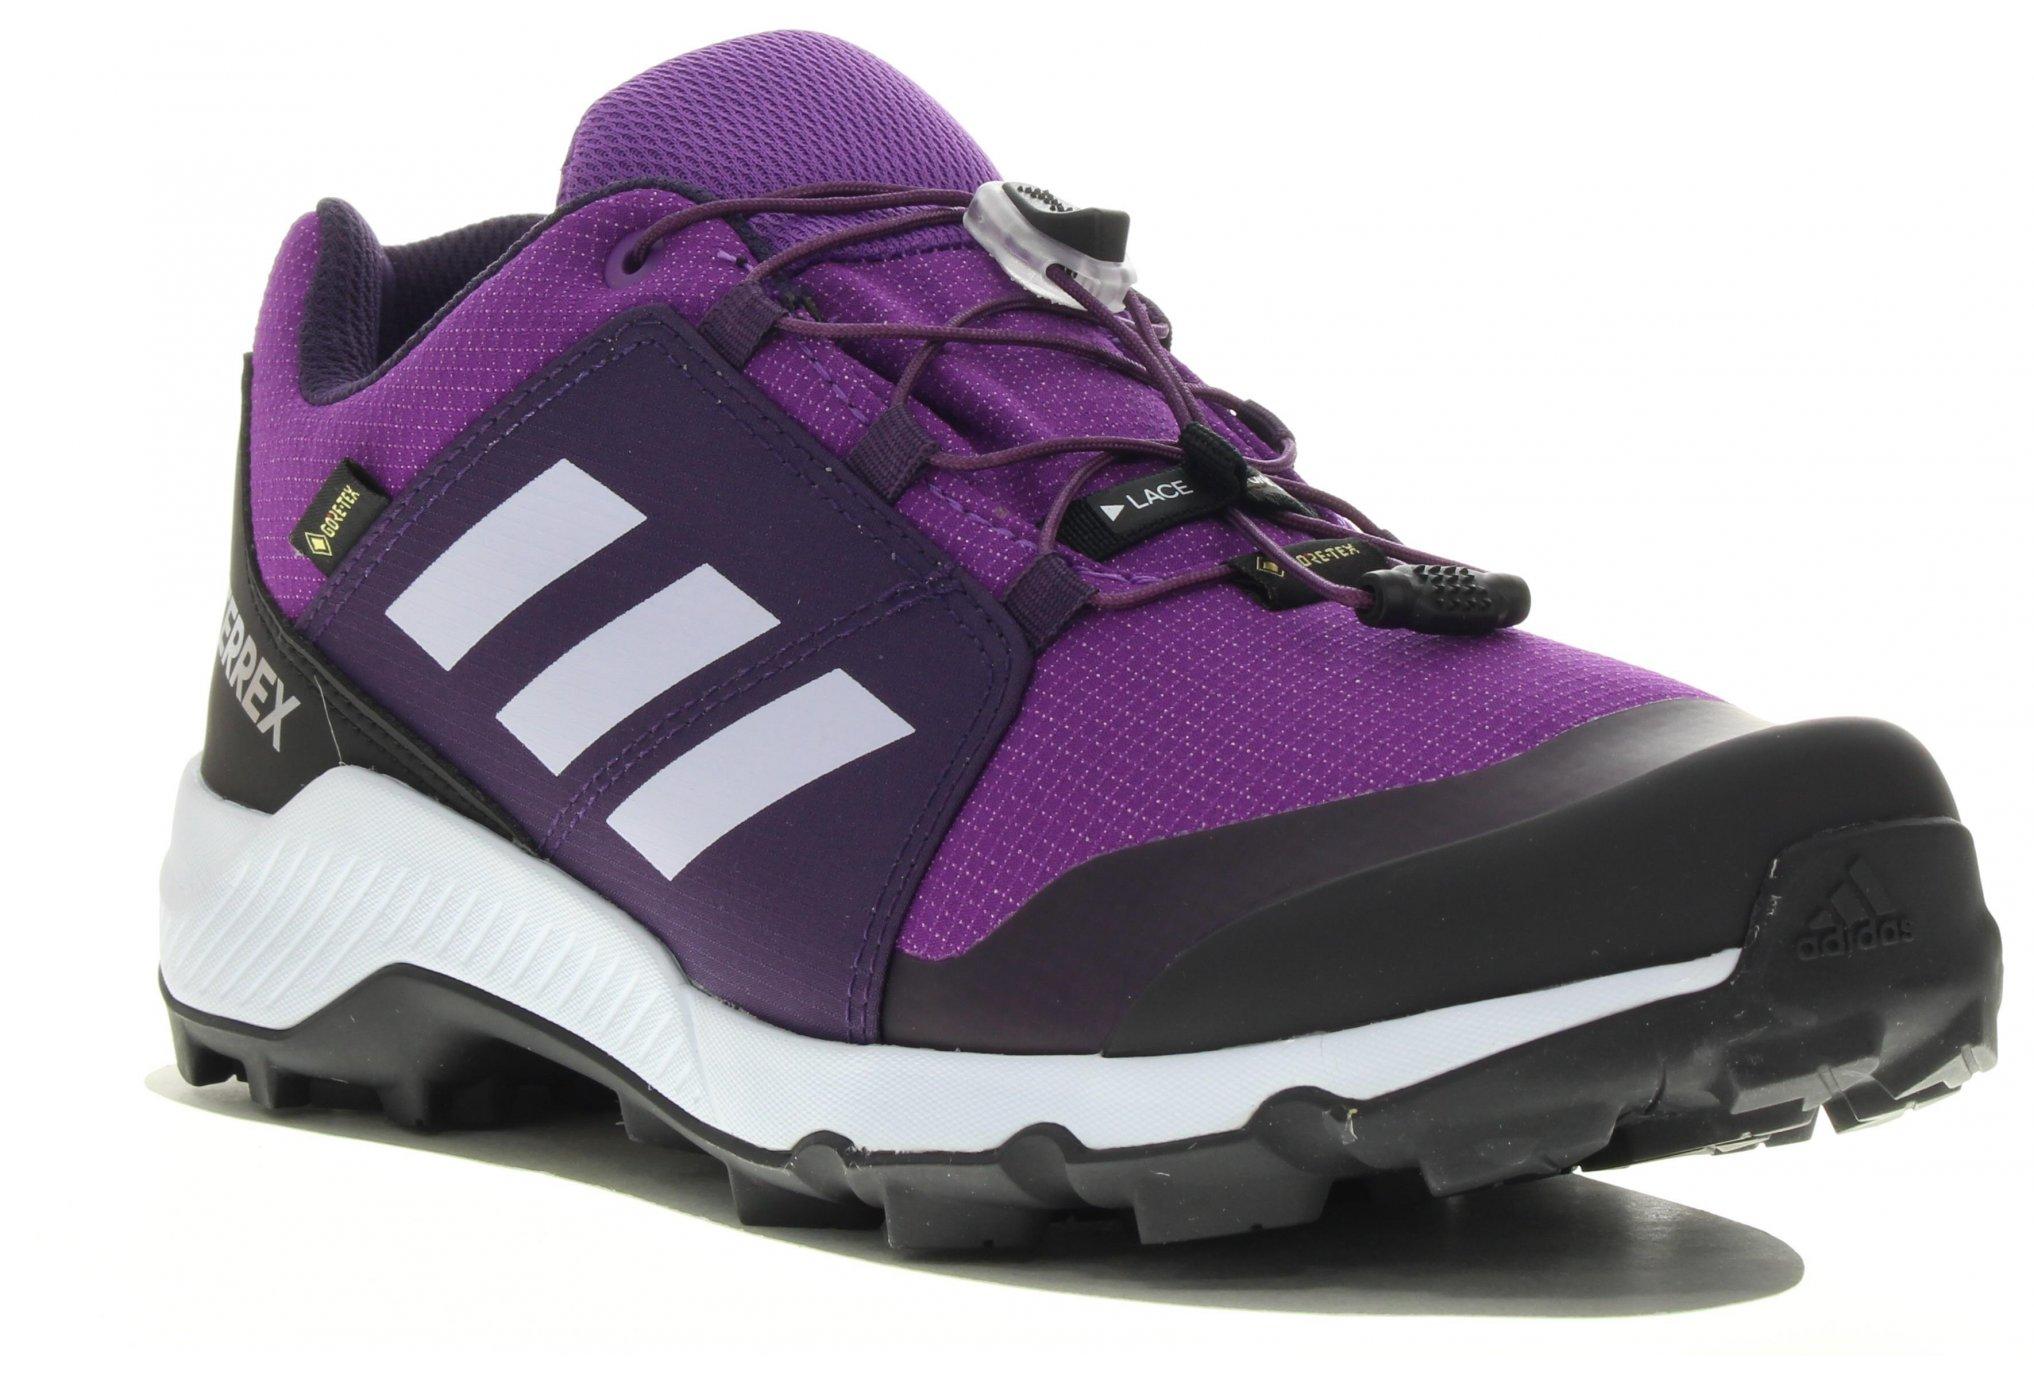 adidas Terrex Gore-Tex Fille Chaussures running femme